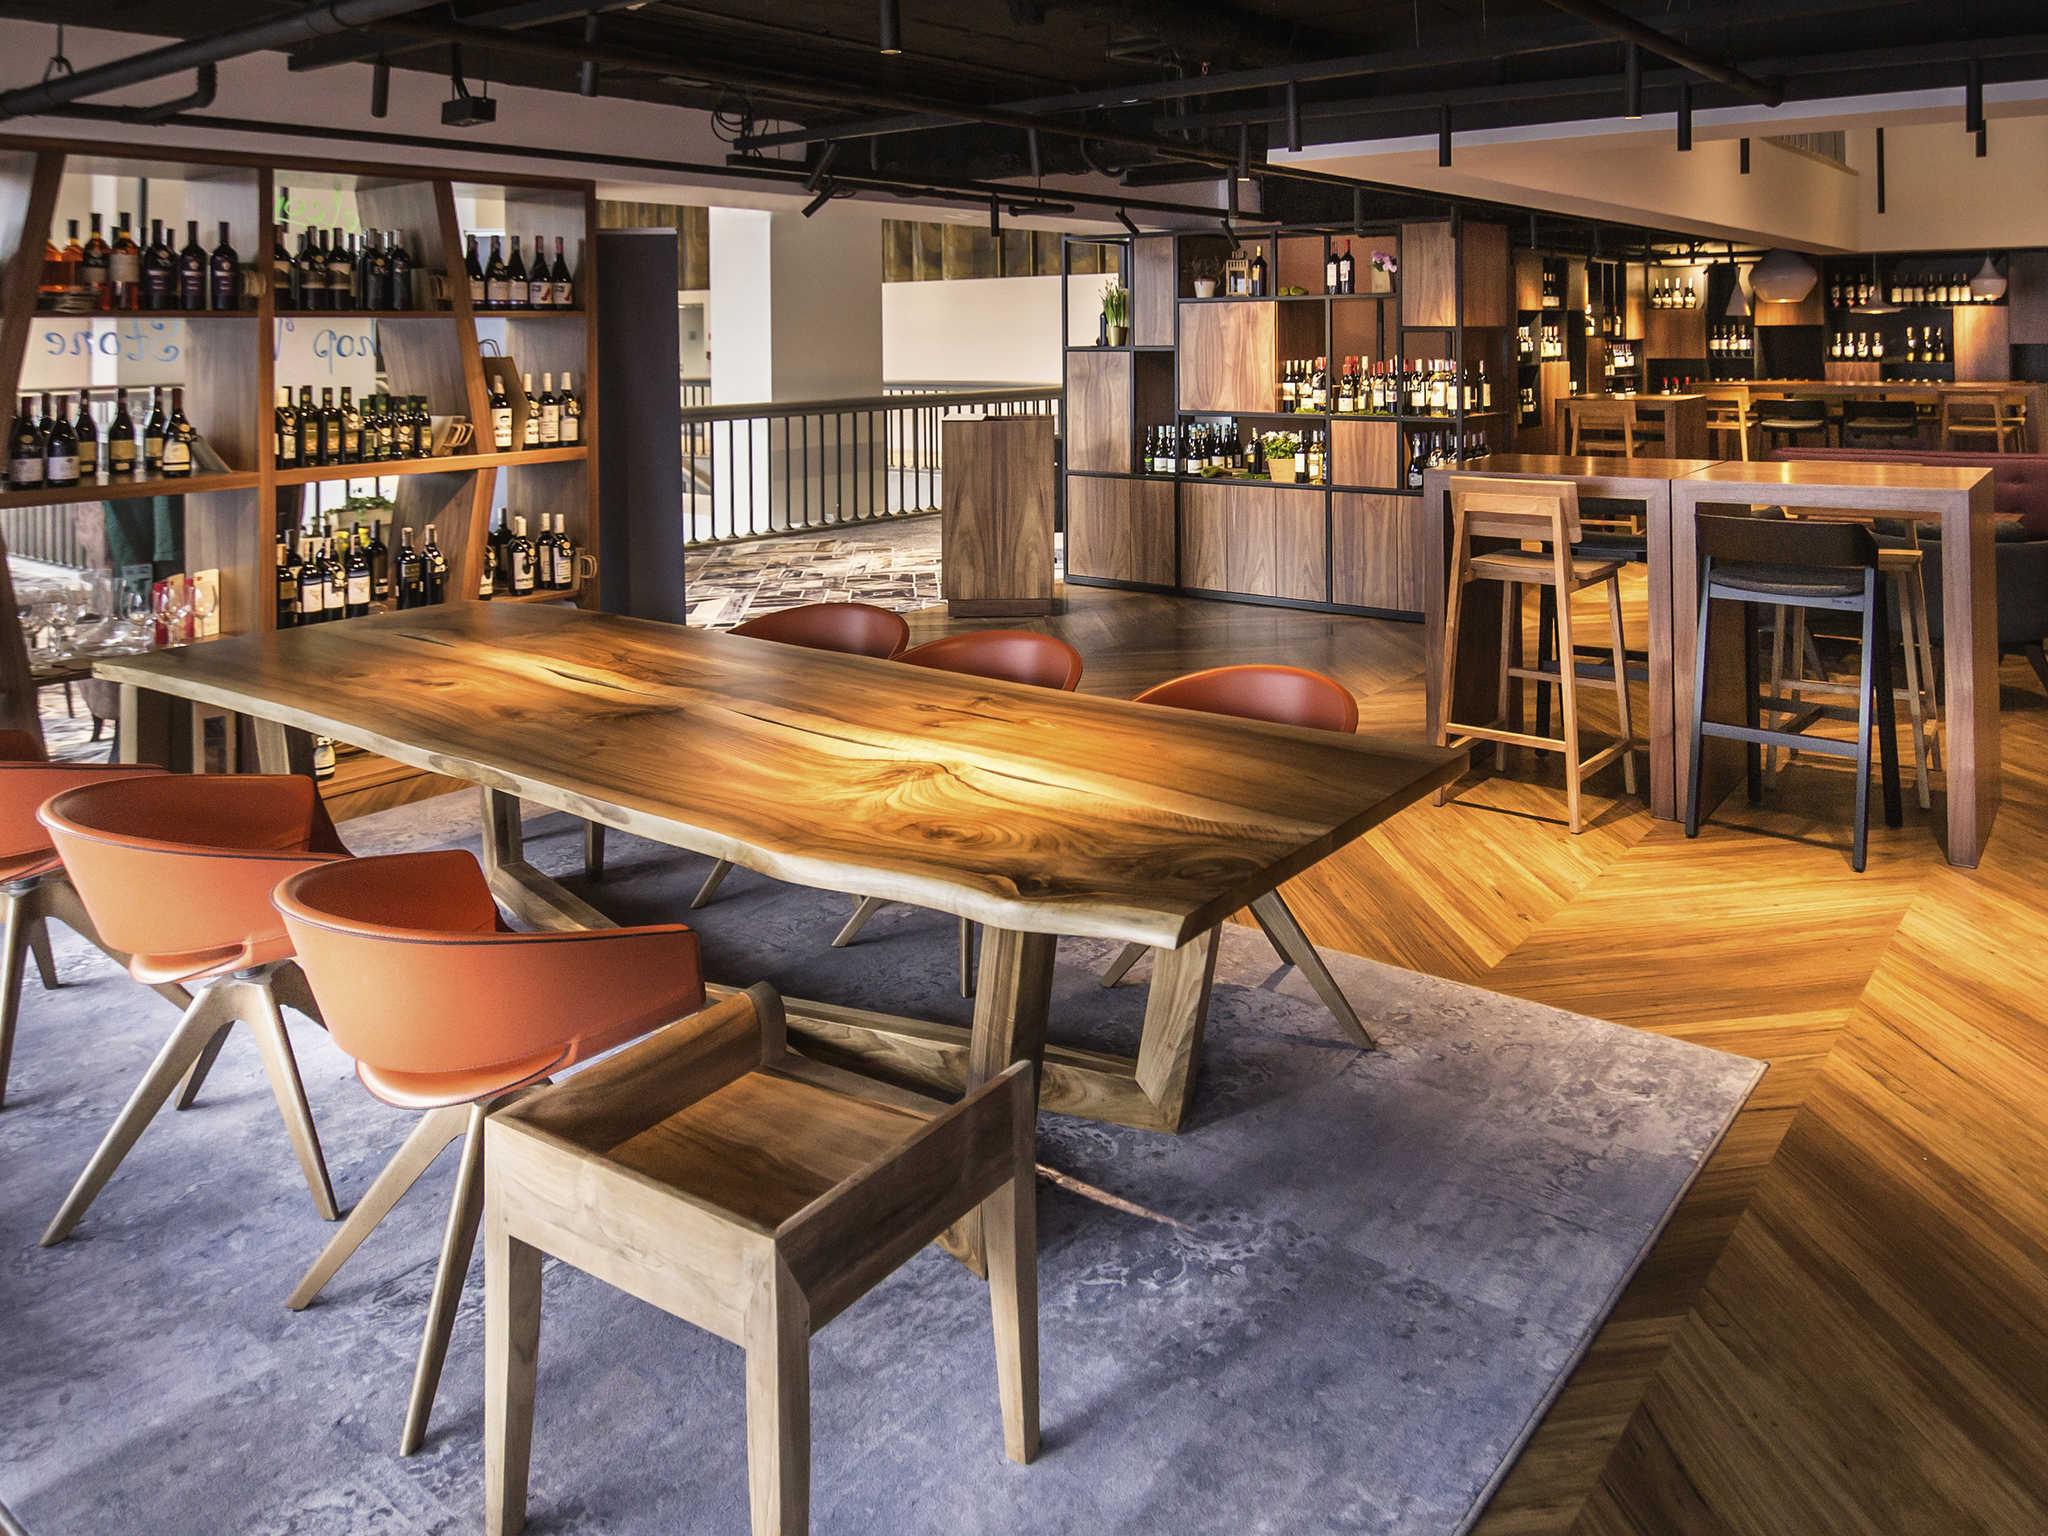 20 Famous Hardwood Flooring Keene Nh 2021 free download hardwood flooring keene nh of hotel novotel poznan centrum regarding restaurant novotel poznan centrum